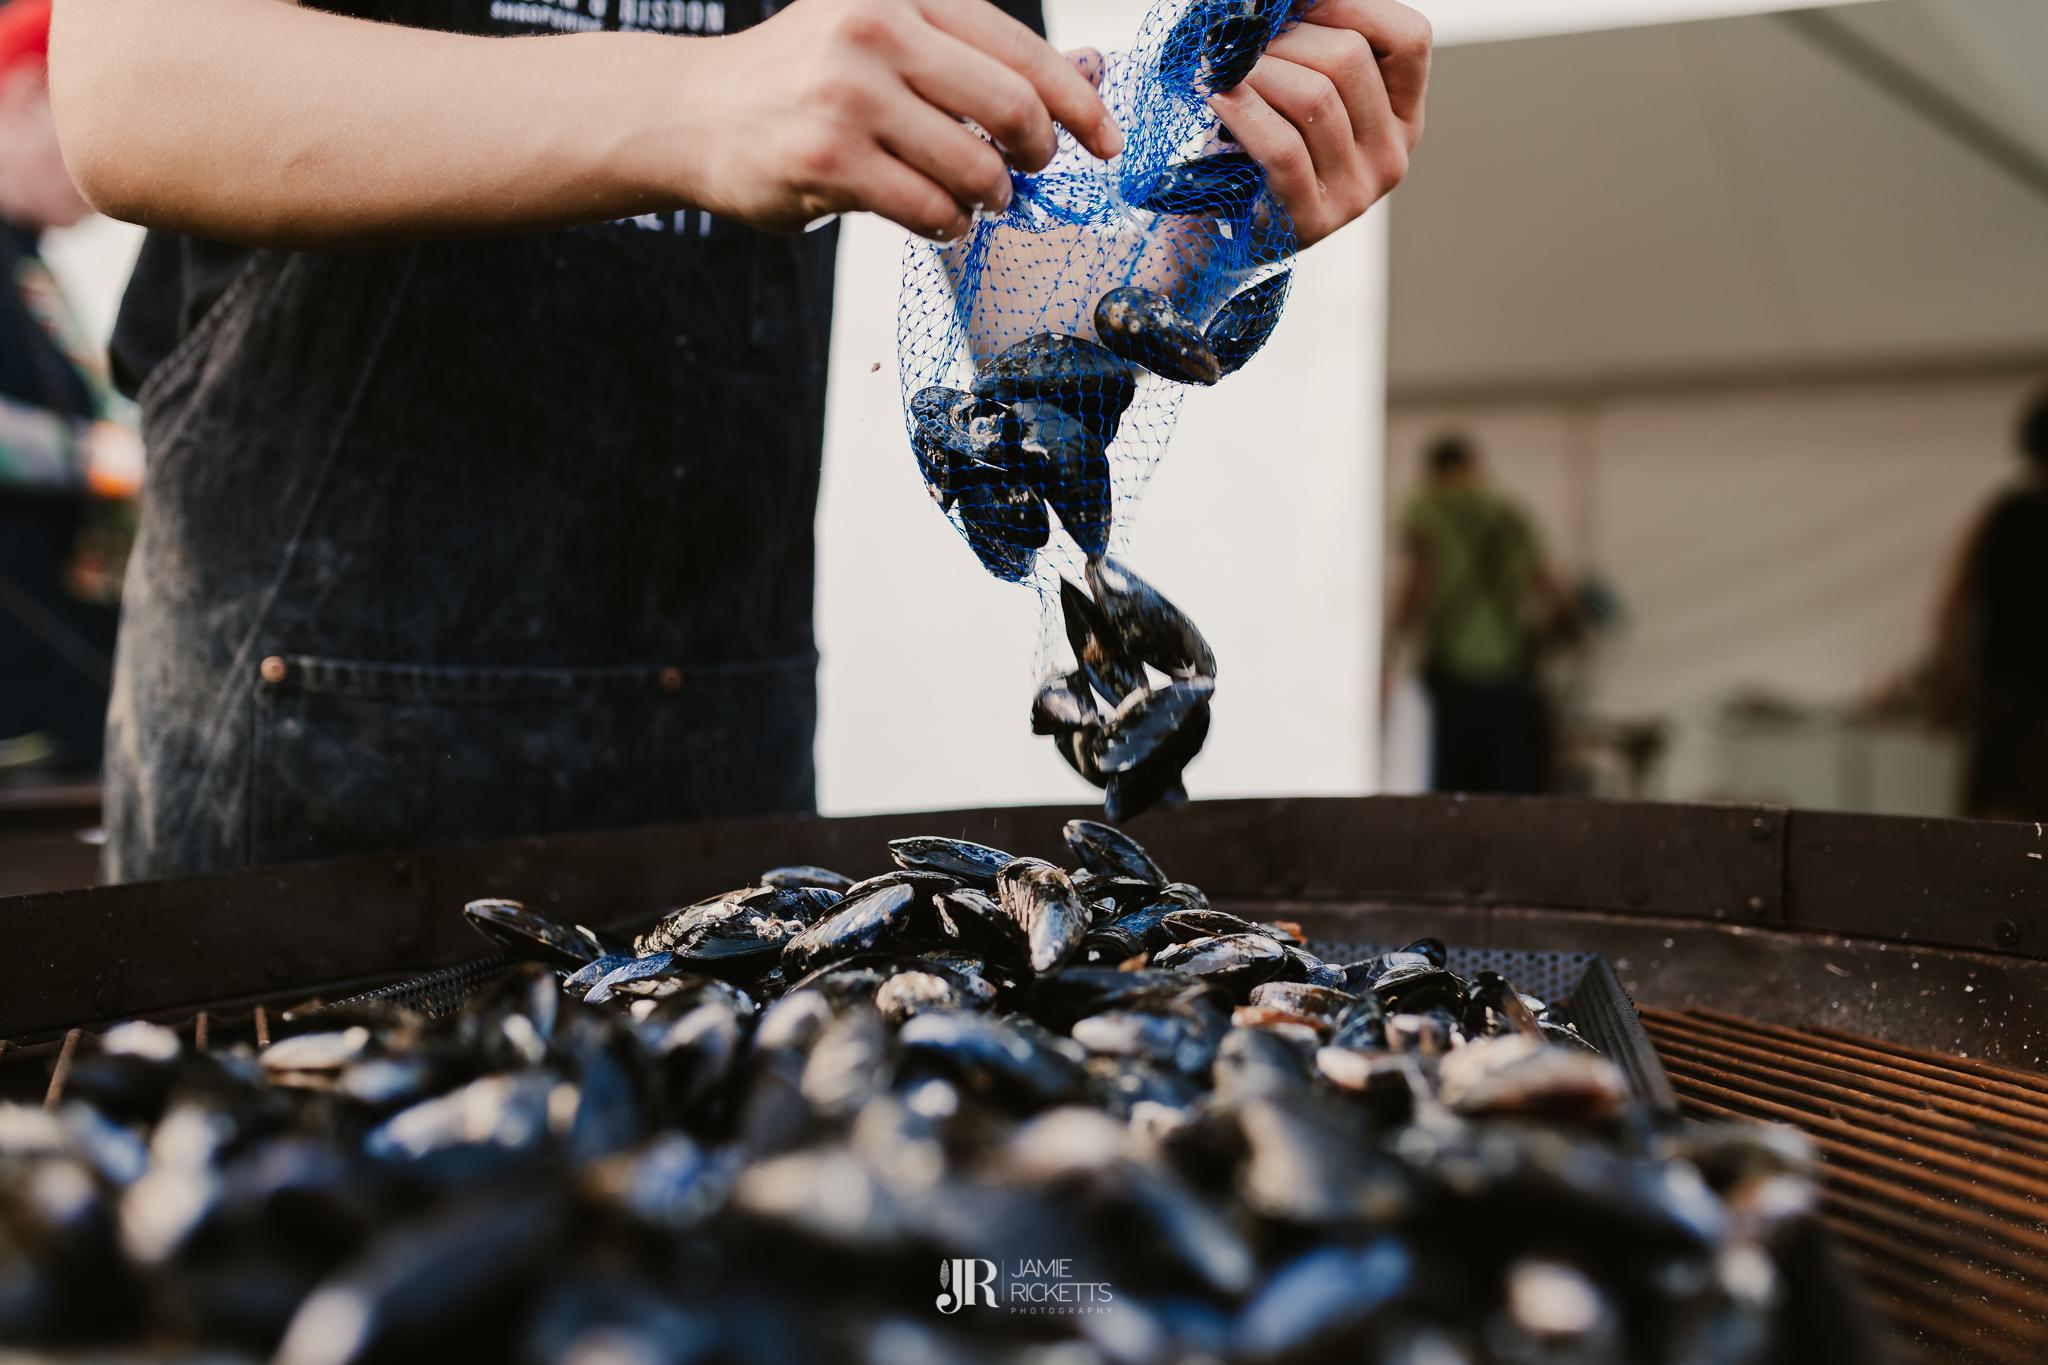 BBQ BANQUET NIGHT-28.06.2019-JR-SM-54.JPG